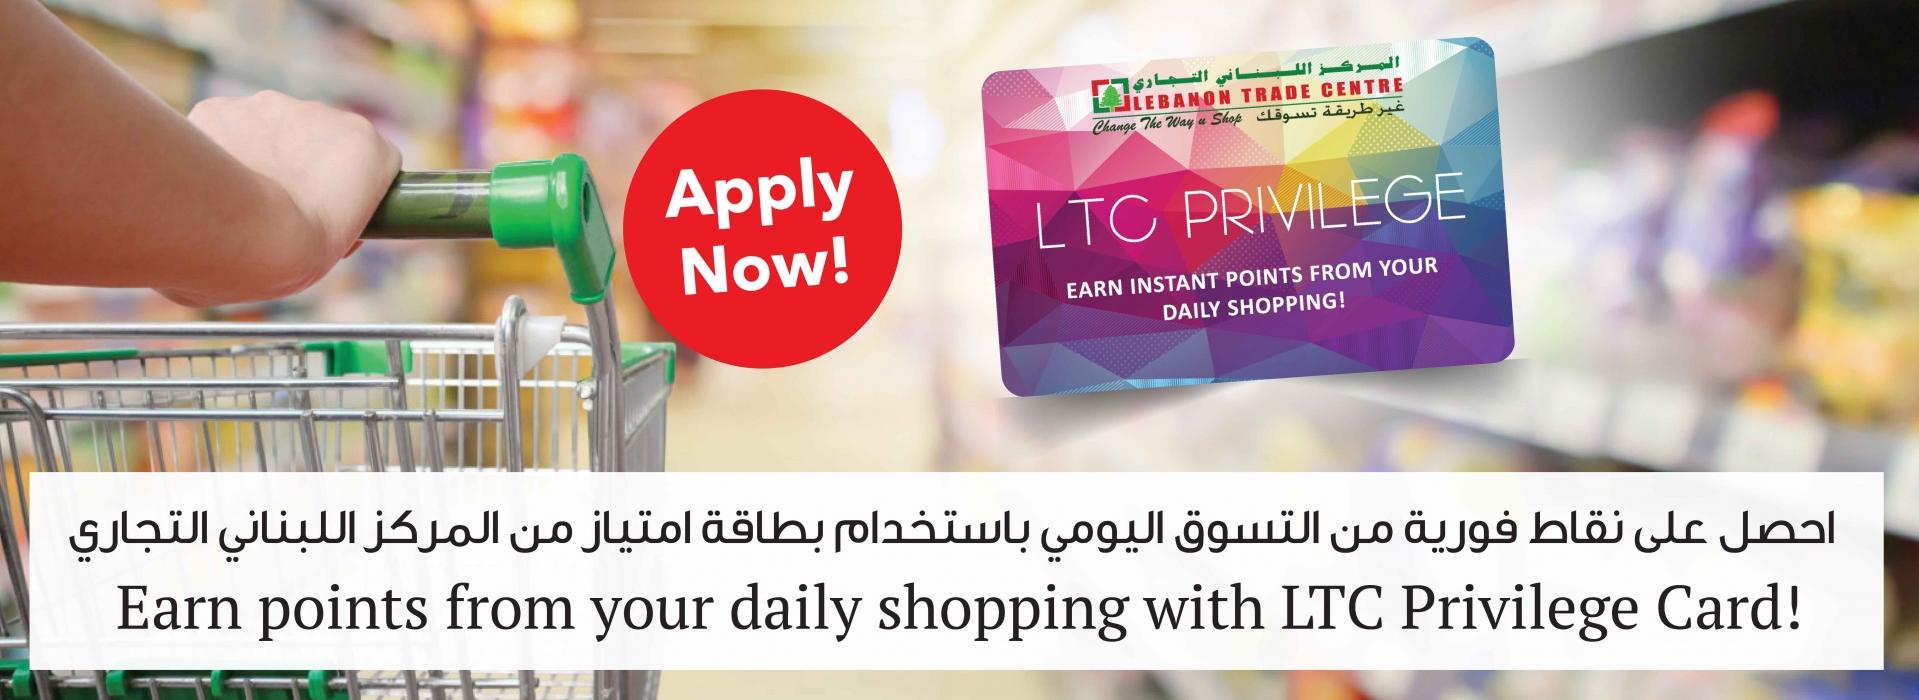 LTC Privilege Card-Apply now!